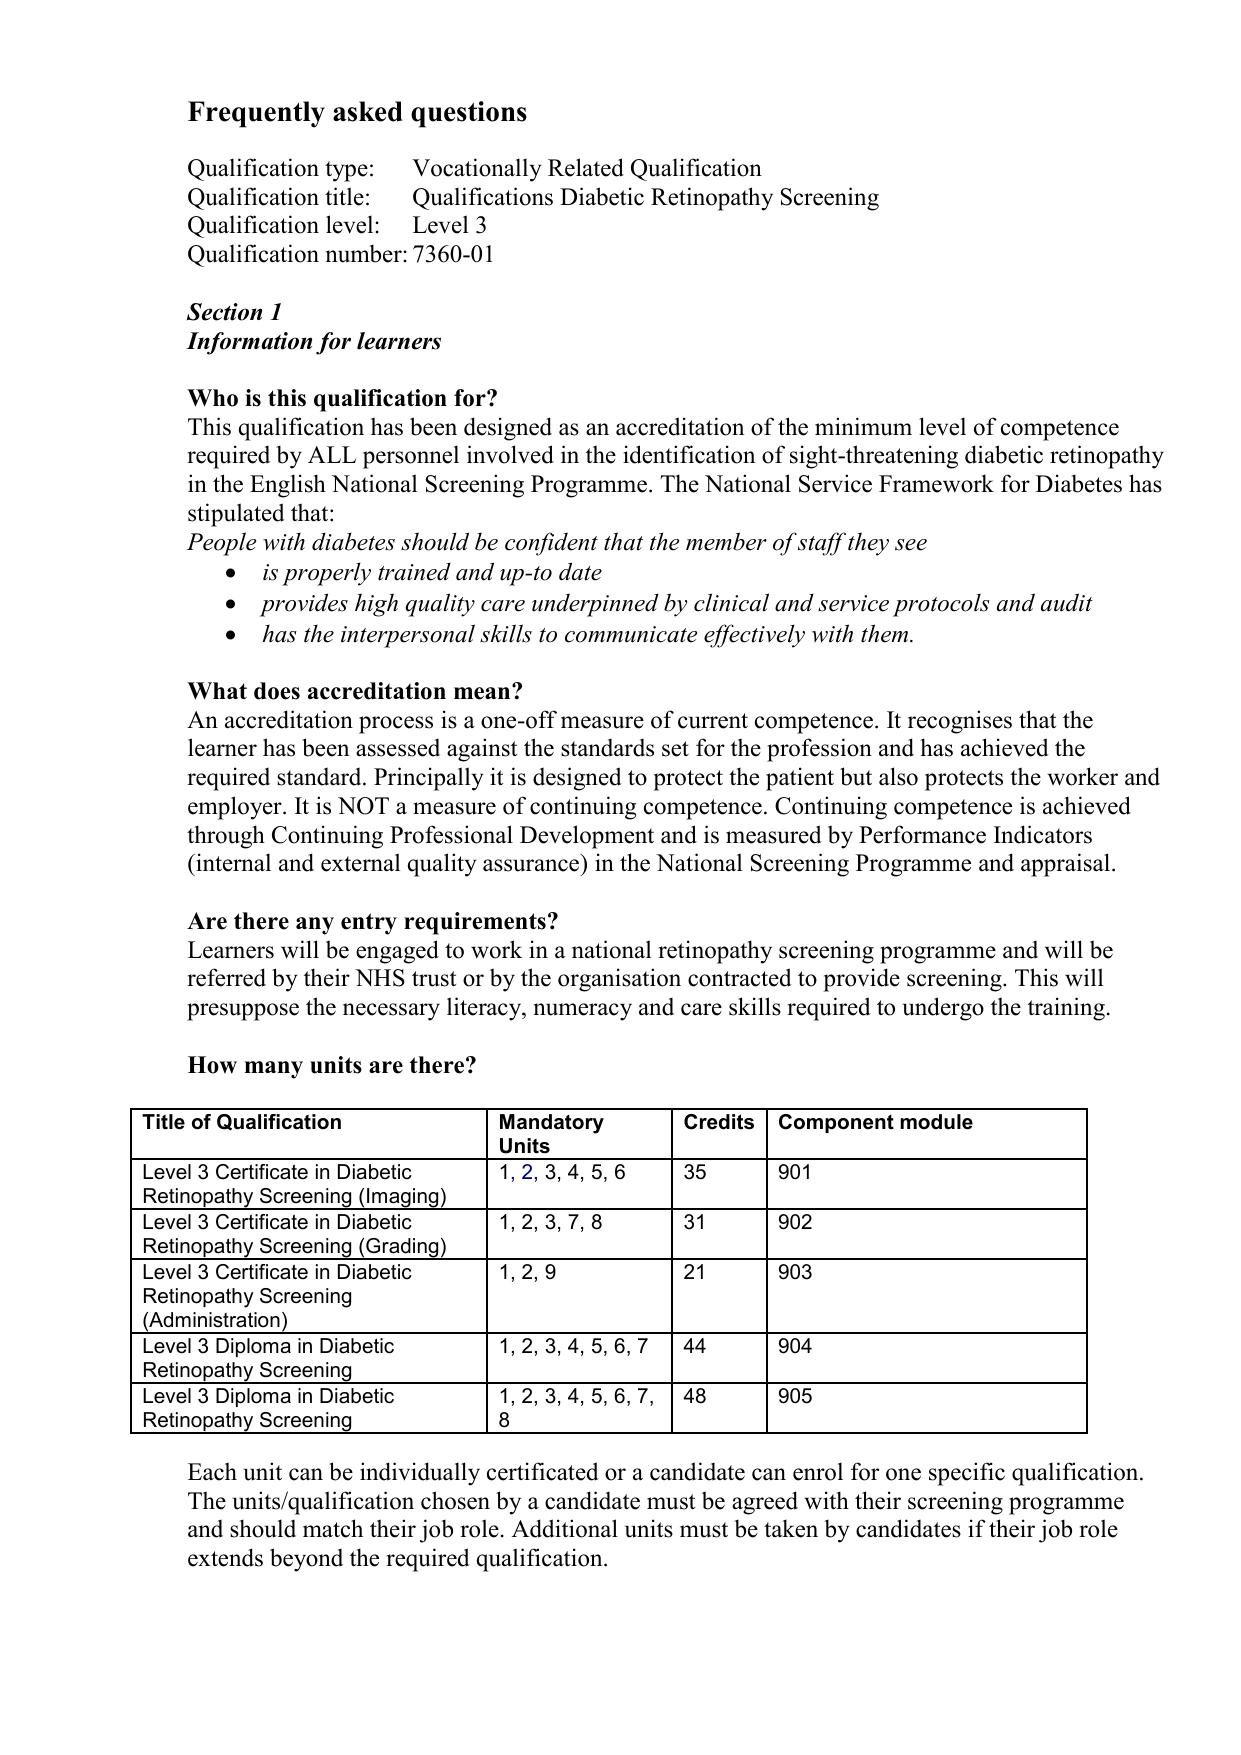 Template Qualifications In Diabetic Retinopathy Screening